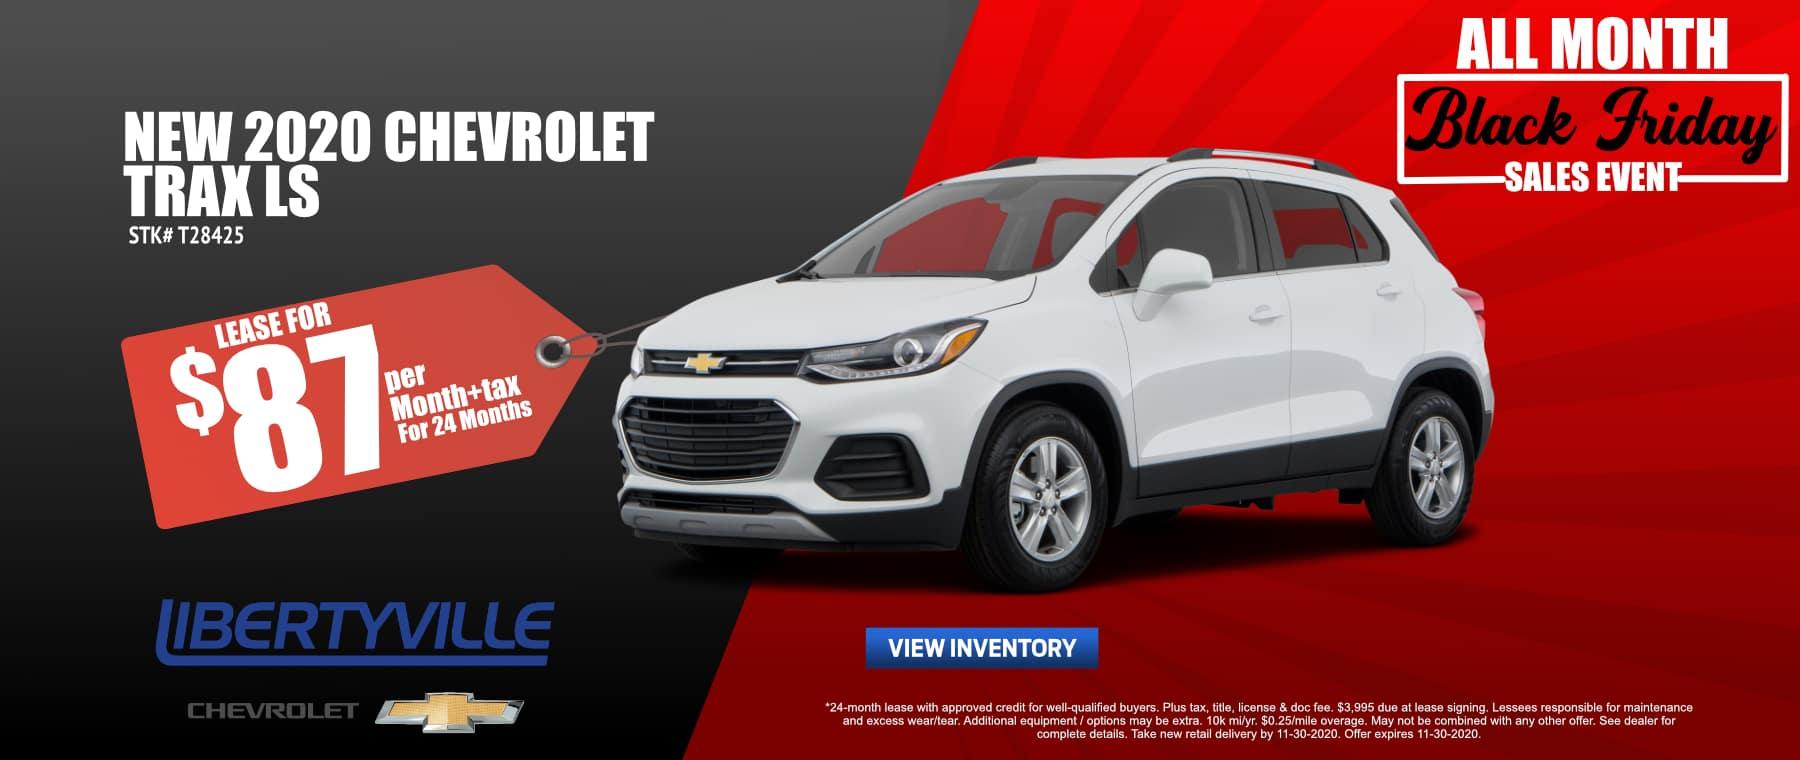 November-2020_TRAX_Lease_LIbertyville Chevrolet_2020_SONIC